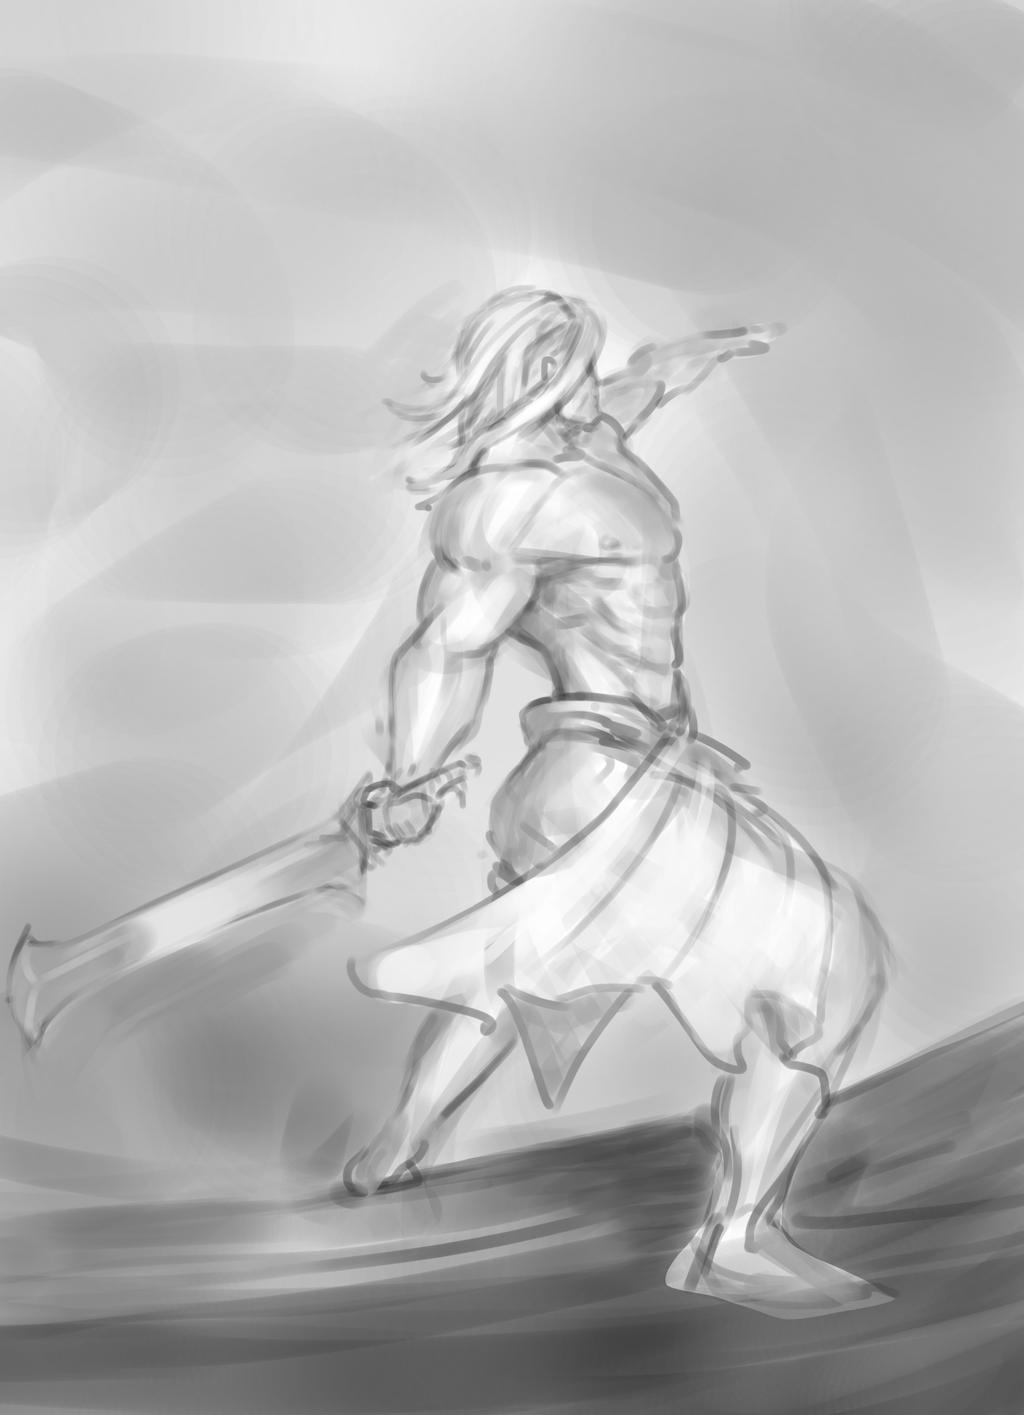 [Image: man_throwing_sword_into_orbit_sketch_by_...sDHSg3JuVw]